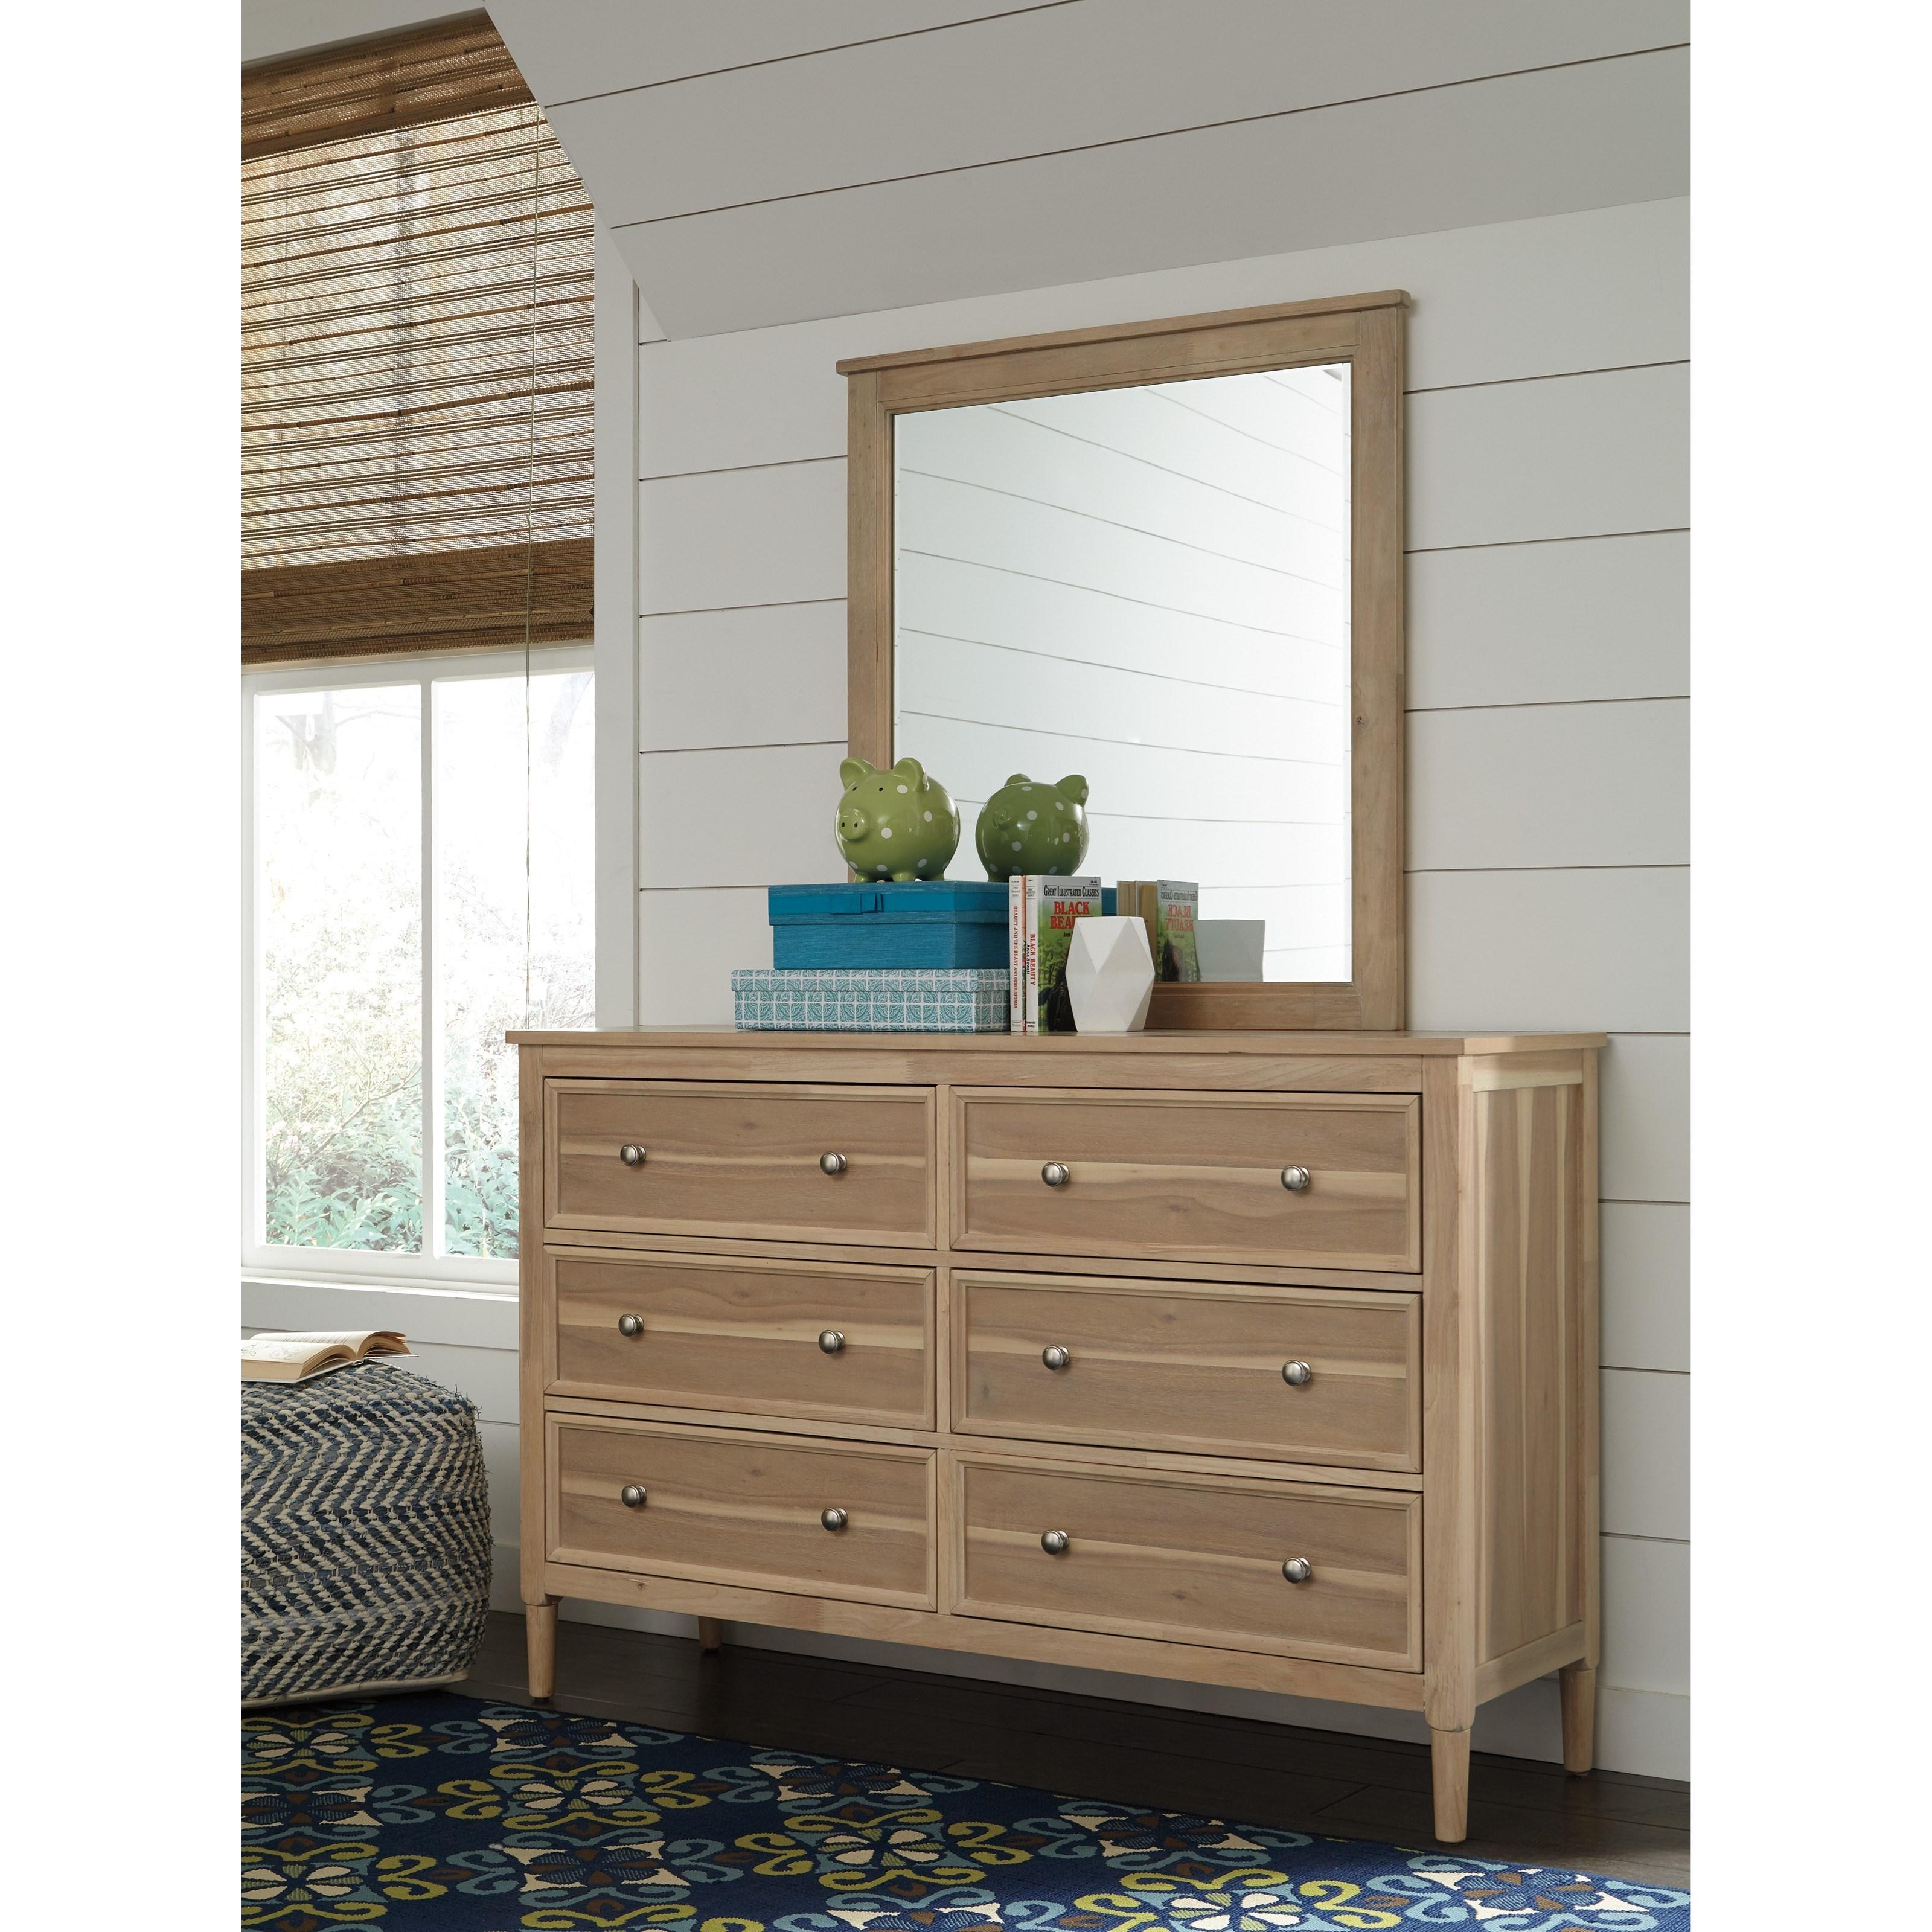 Ashley Signature Design Klasholm Contemporary Dresser And Mirror Set Dunk Bright Furniture